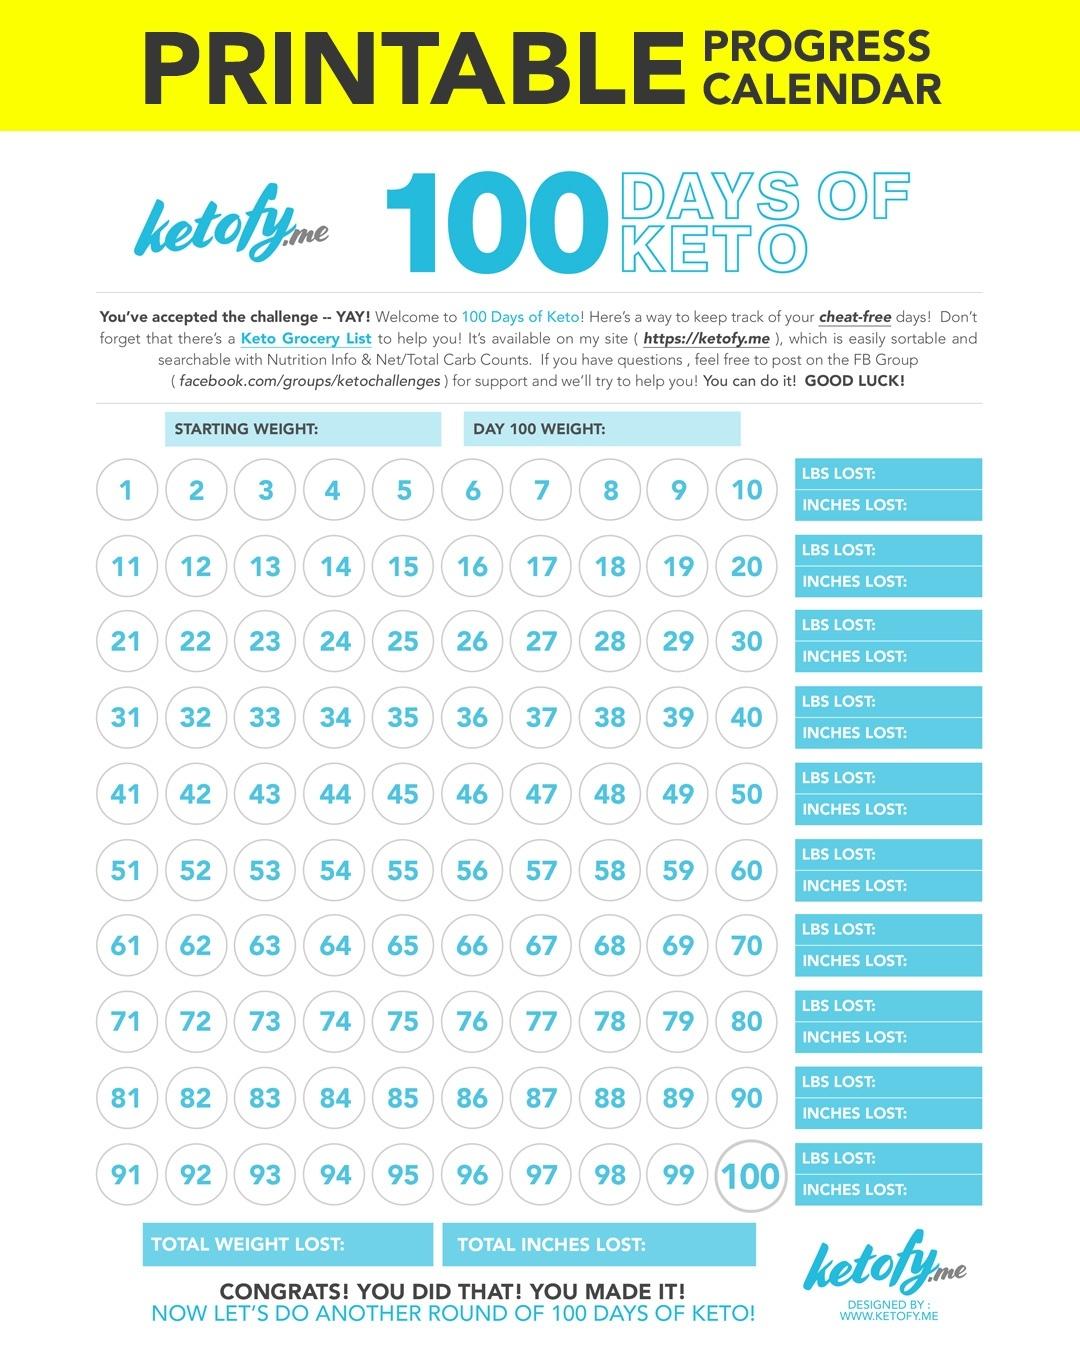 Keto ~ Fy Me | Cut Carbs, Not Flavor! • 100 Days Of Keto Challenge_Countdown Calendar Days Printable